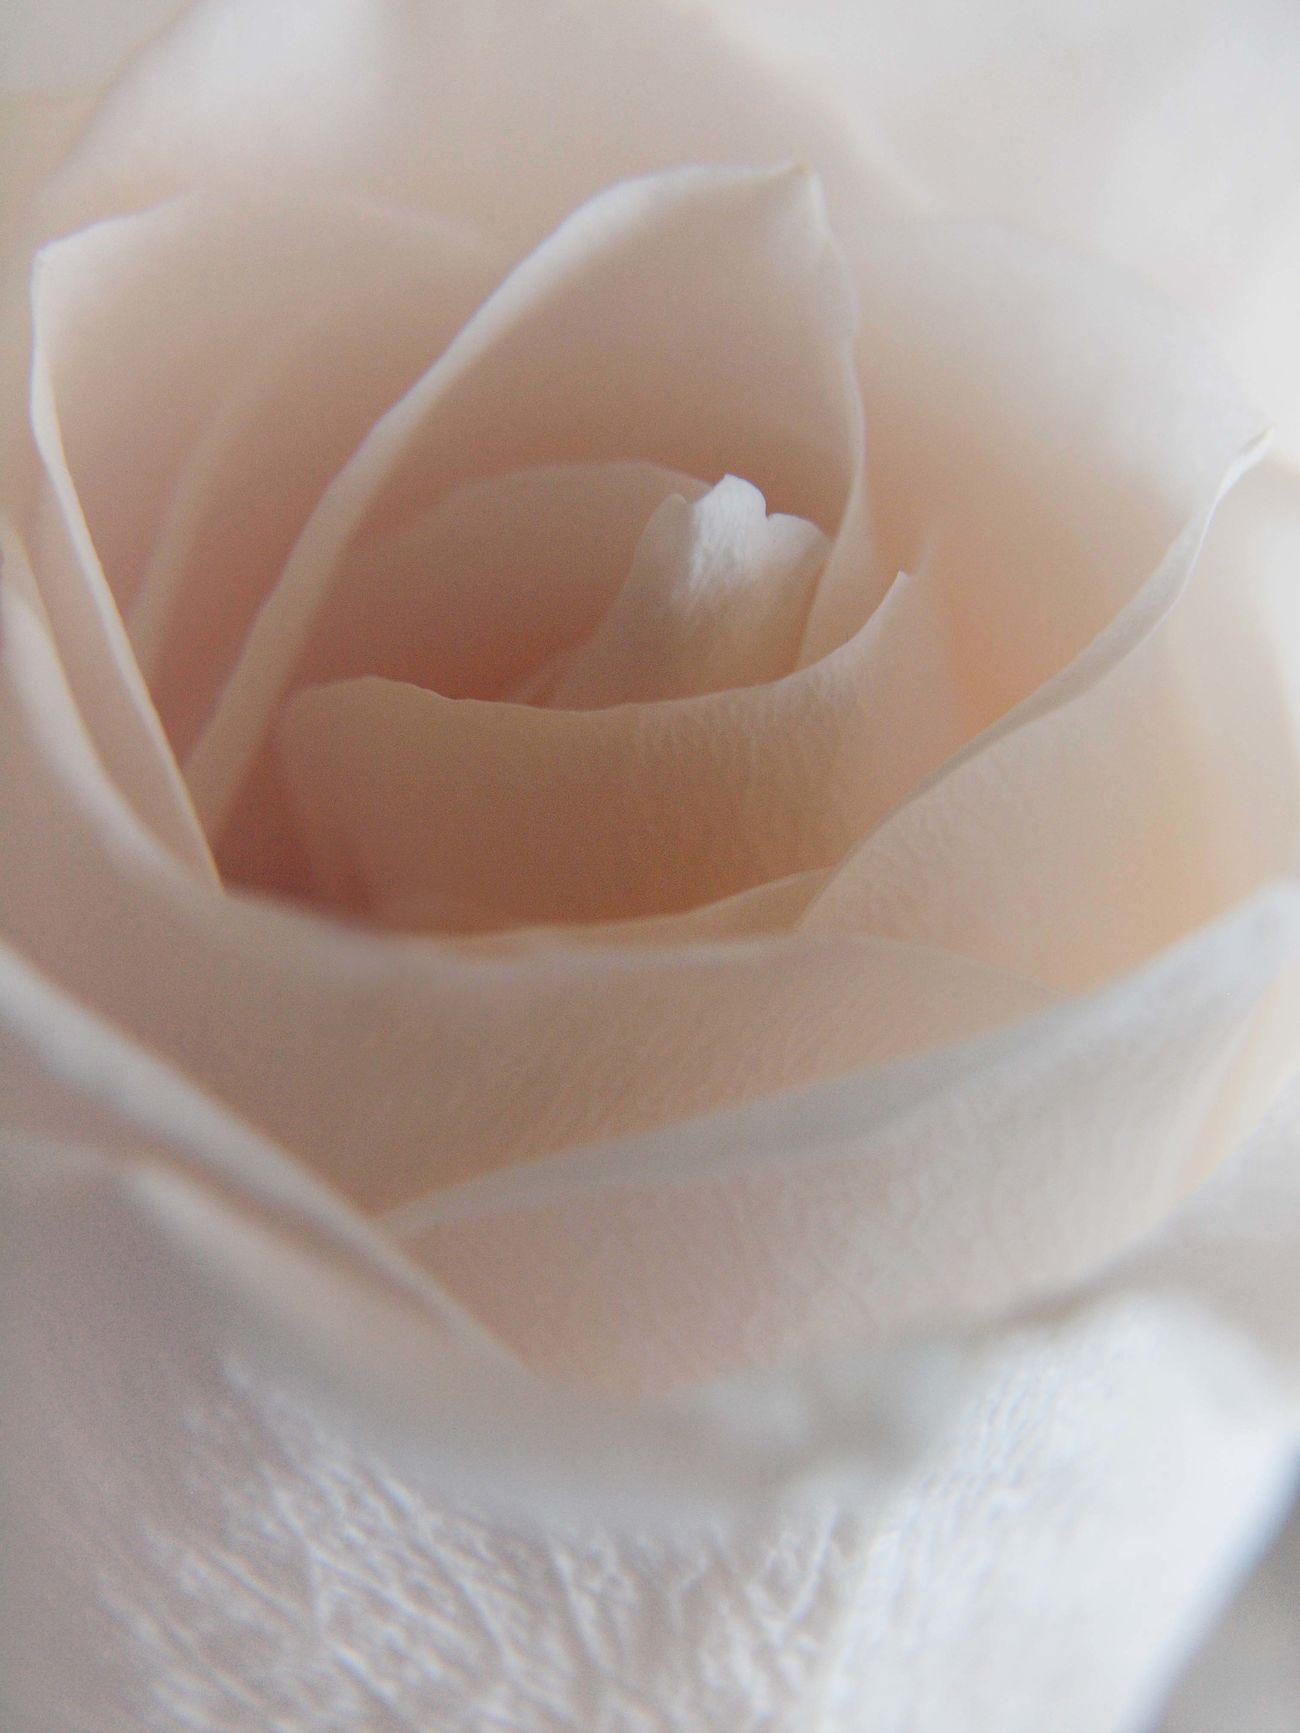 Petal Kisses Close-up Extreme Close-up Flower Fragility Gentle Rose Macro Petal Pink Color Rose - Flower Rosé Softness White